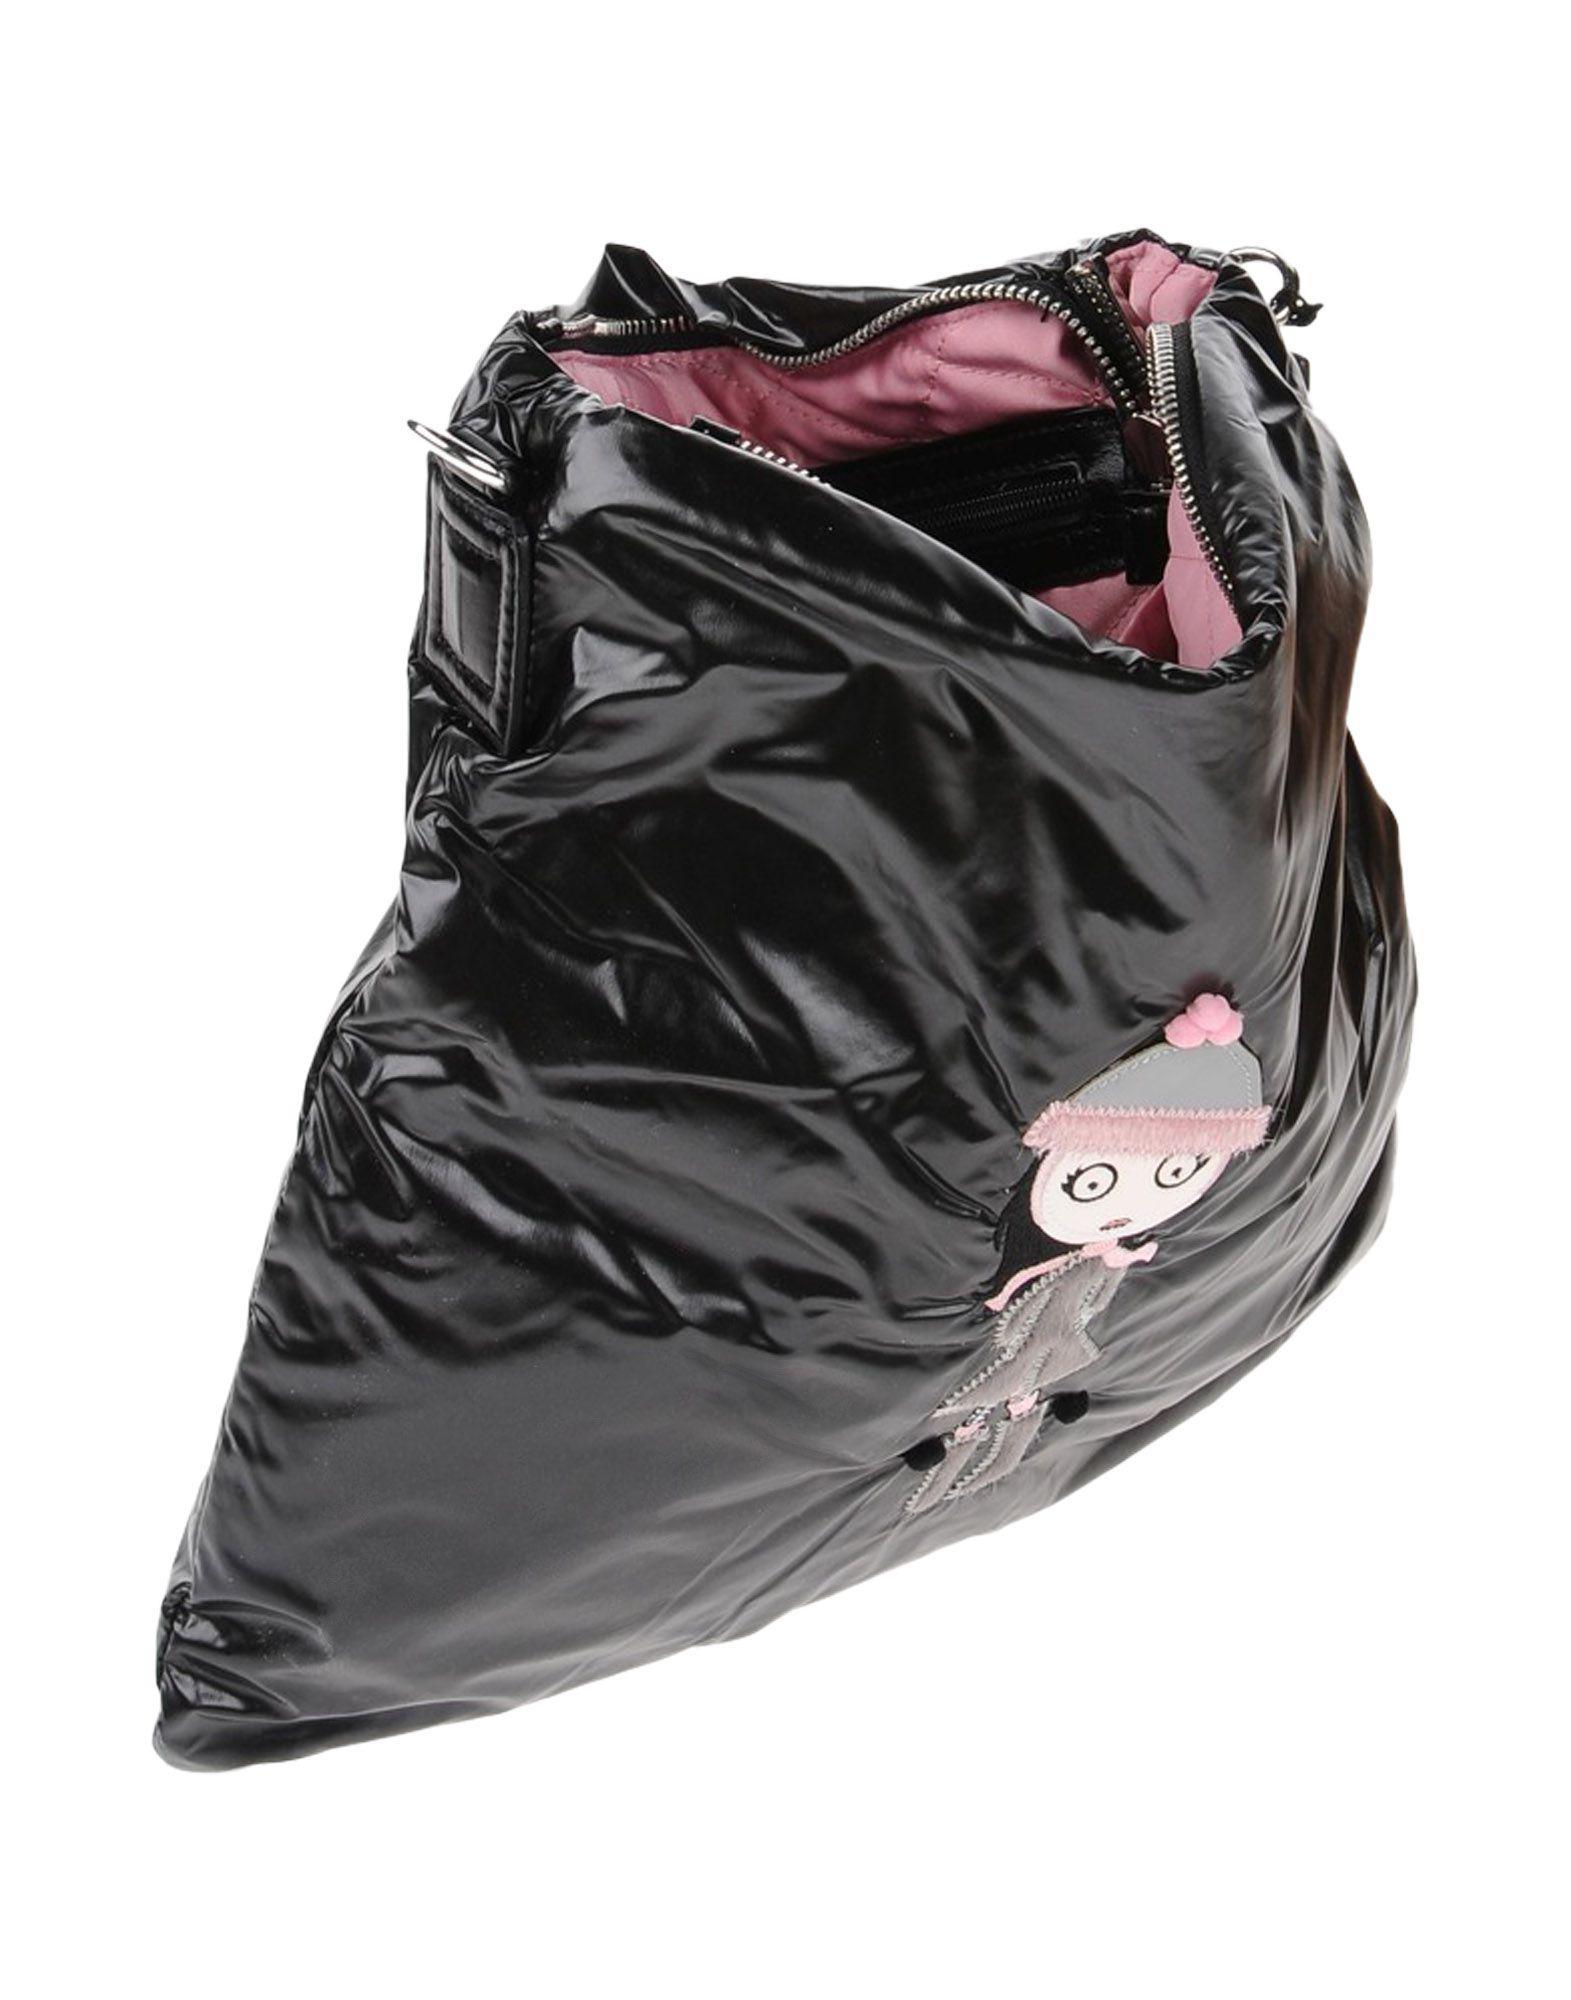 Tosca Blu Synthetic Cross-body Bag in Black